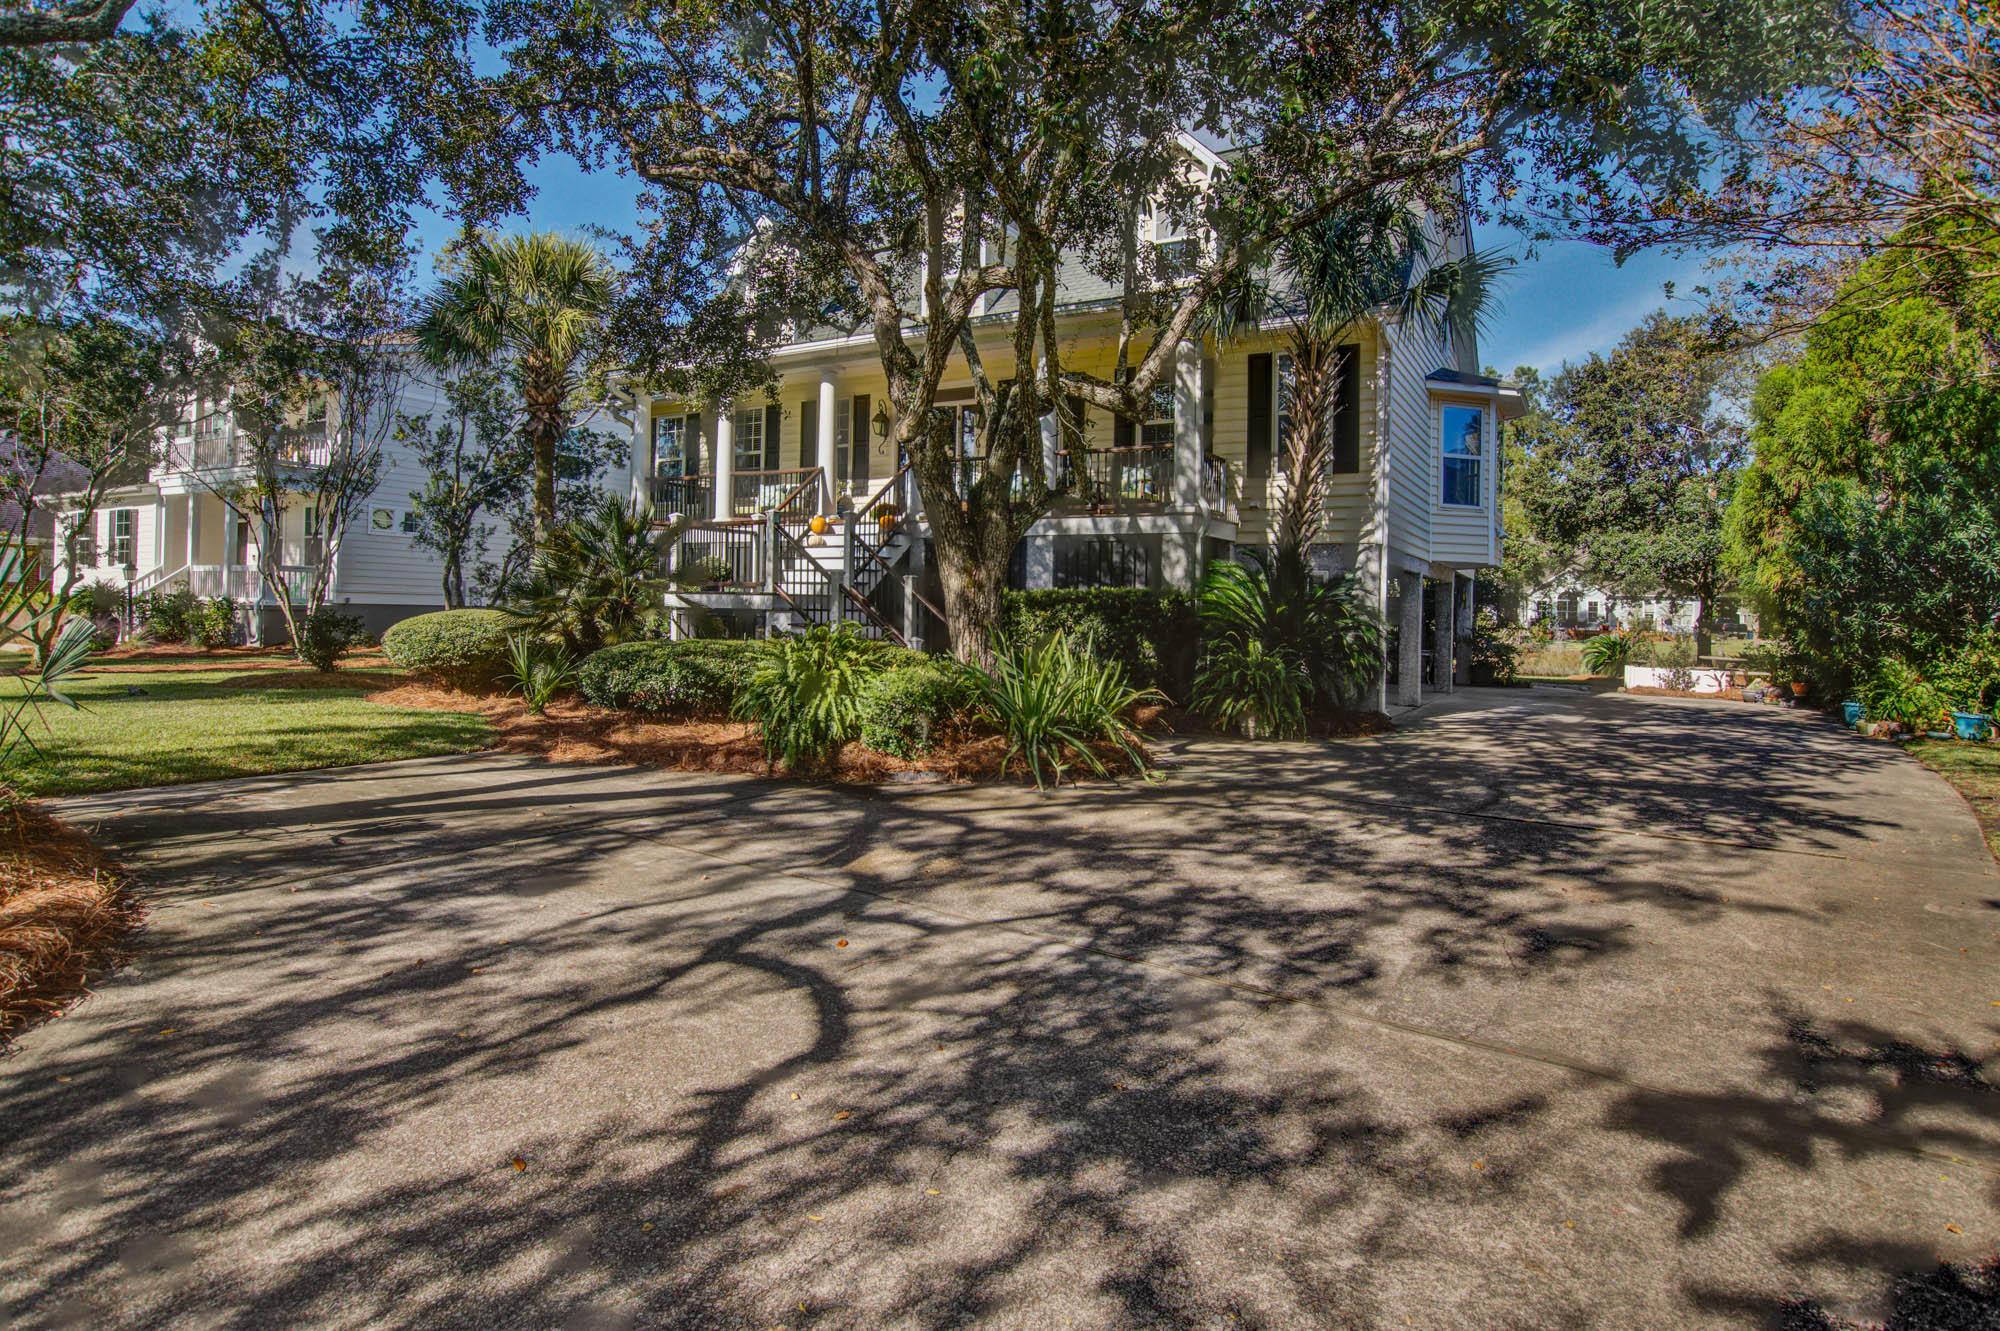 St Thomas Point Homes For Sale - 307 Jamesbury, Charleston, SC - 2